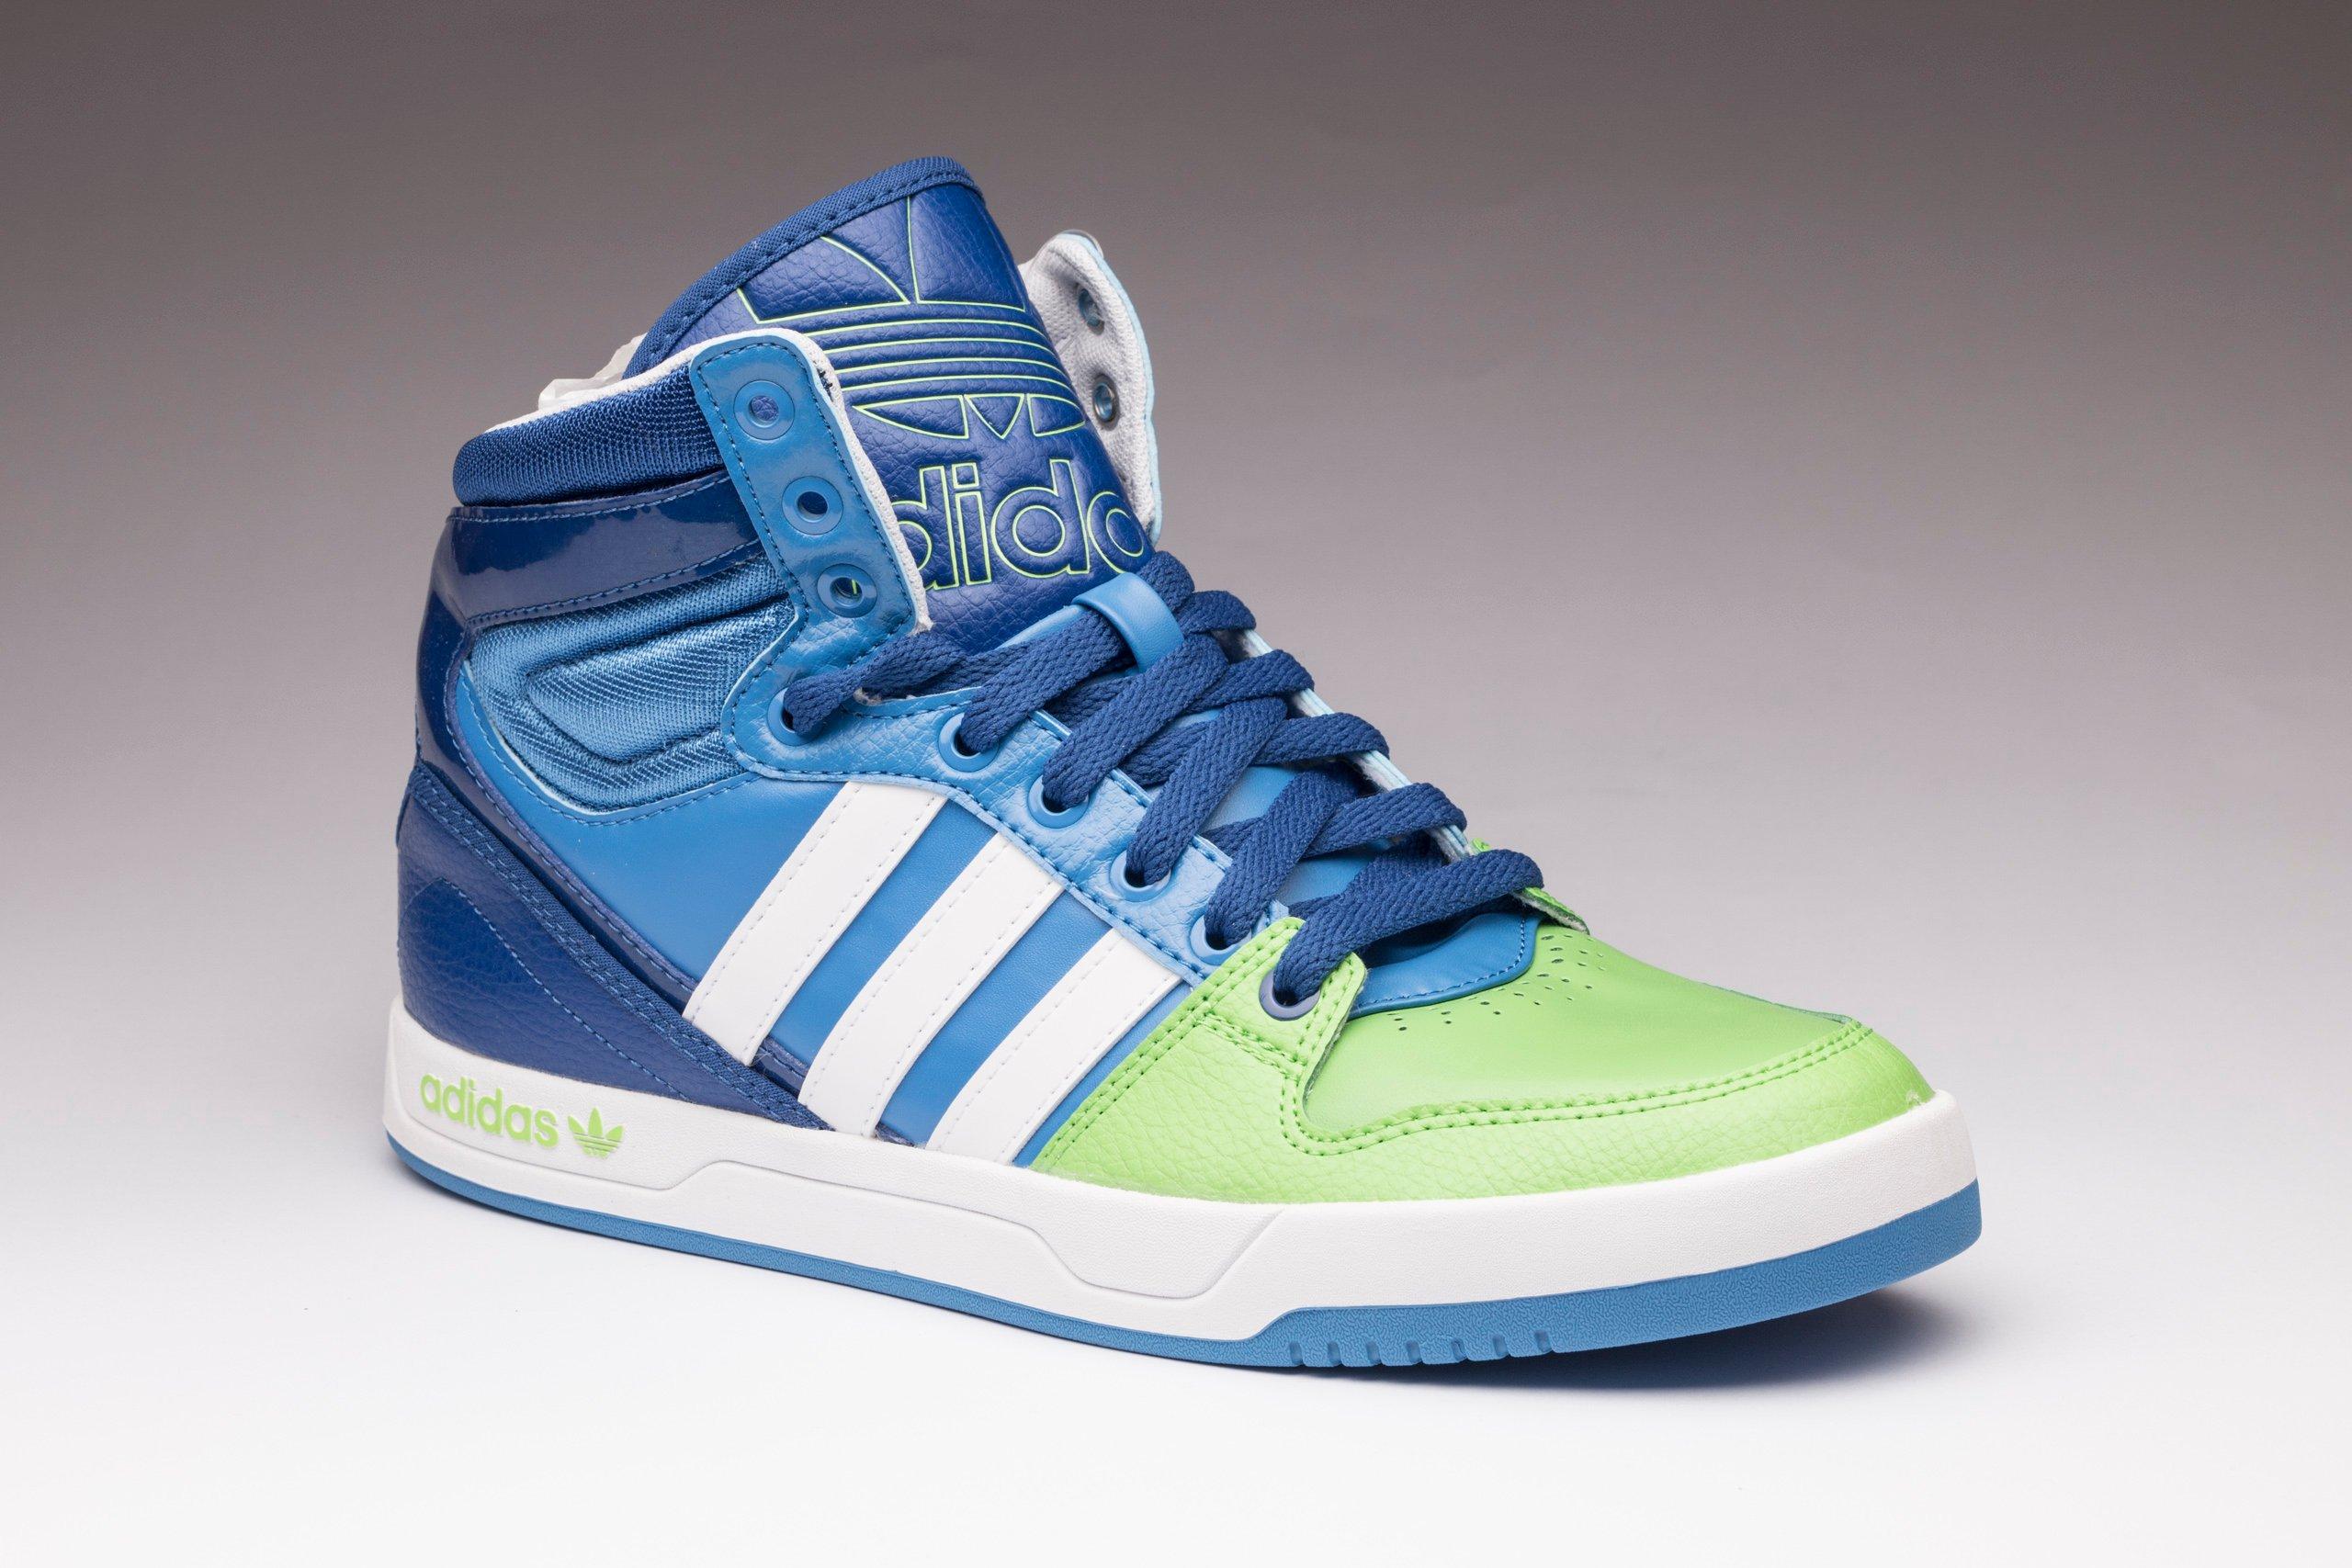 Buty Adidas Hard Court Attitude Forum Mid 28cm